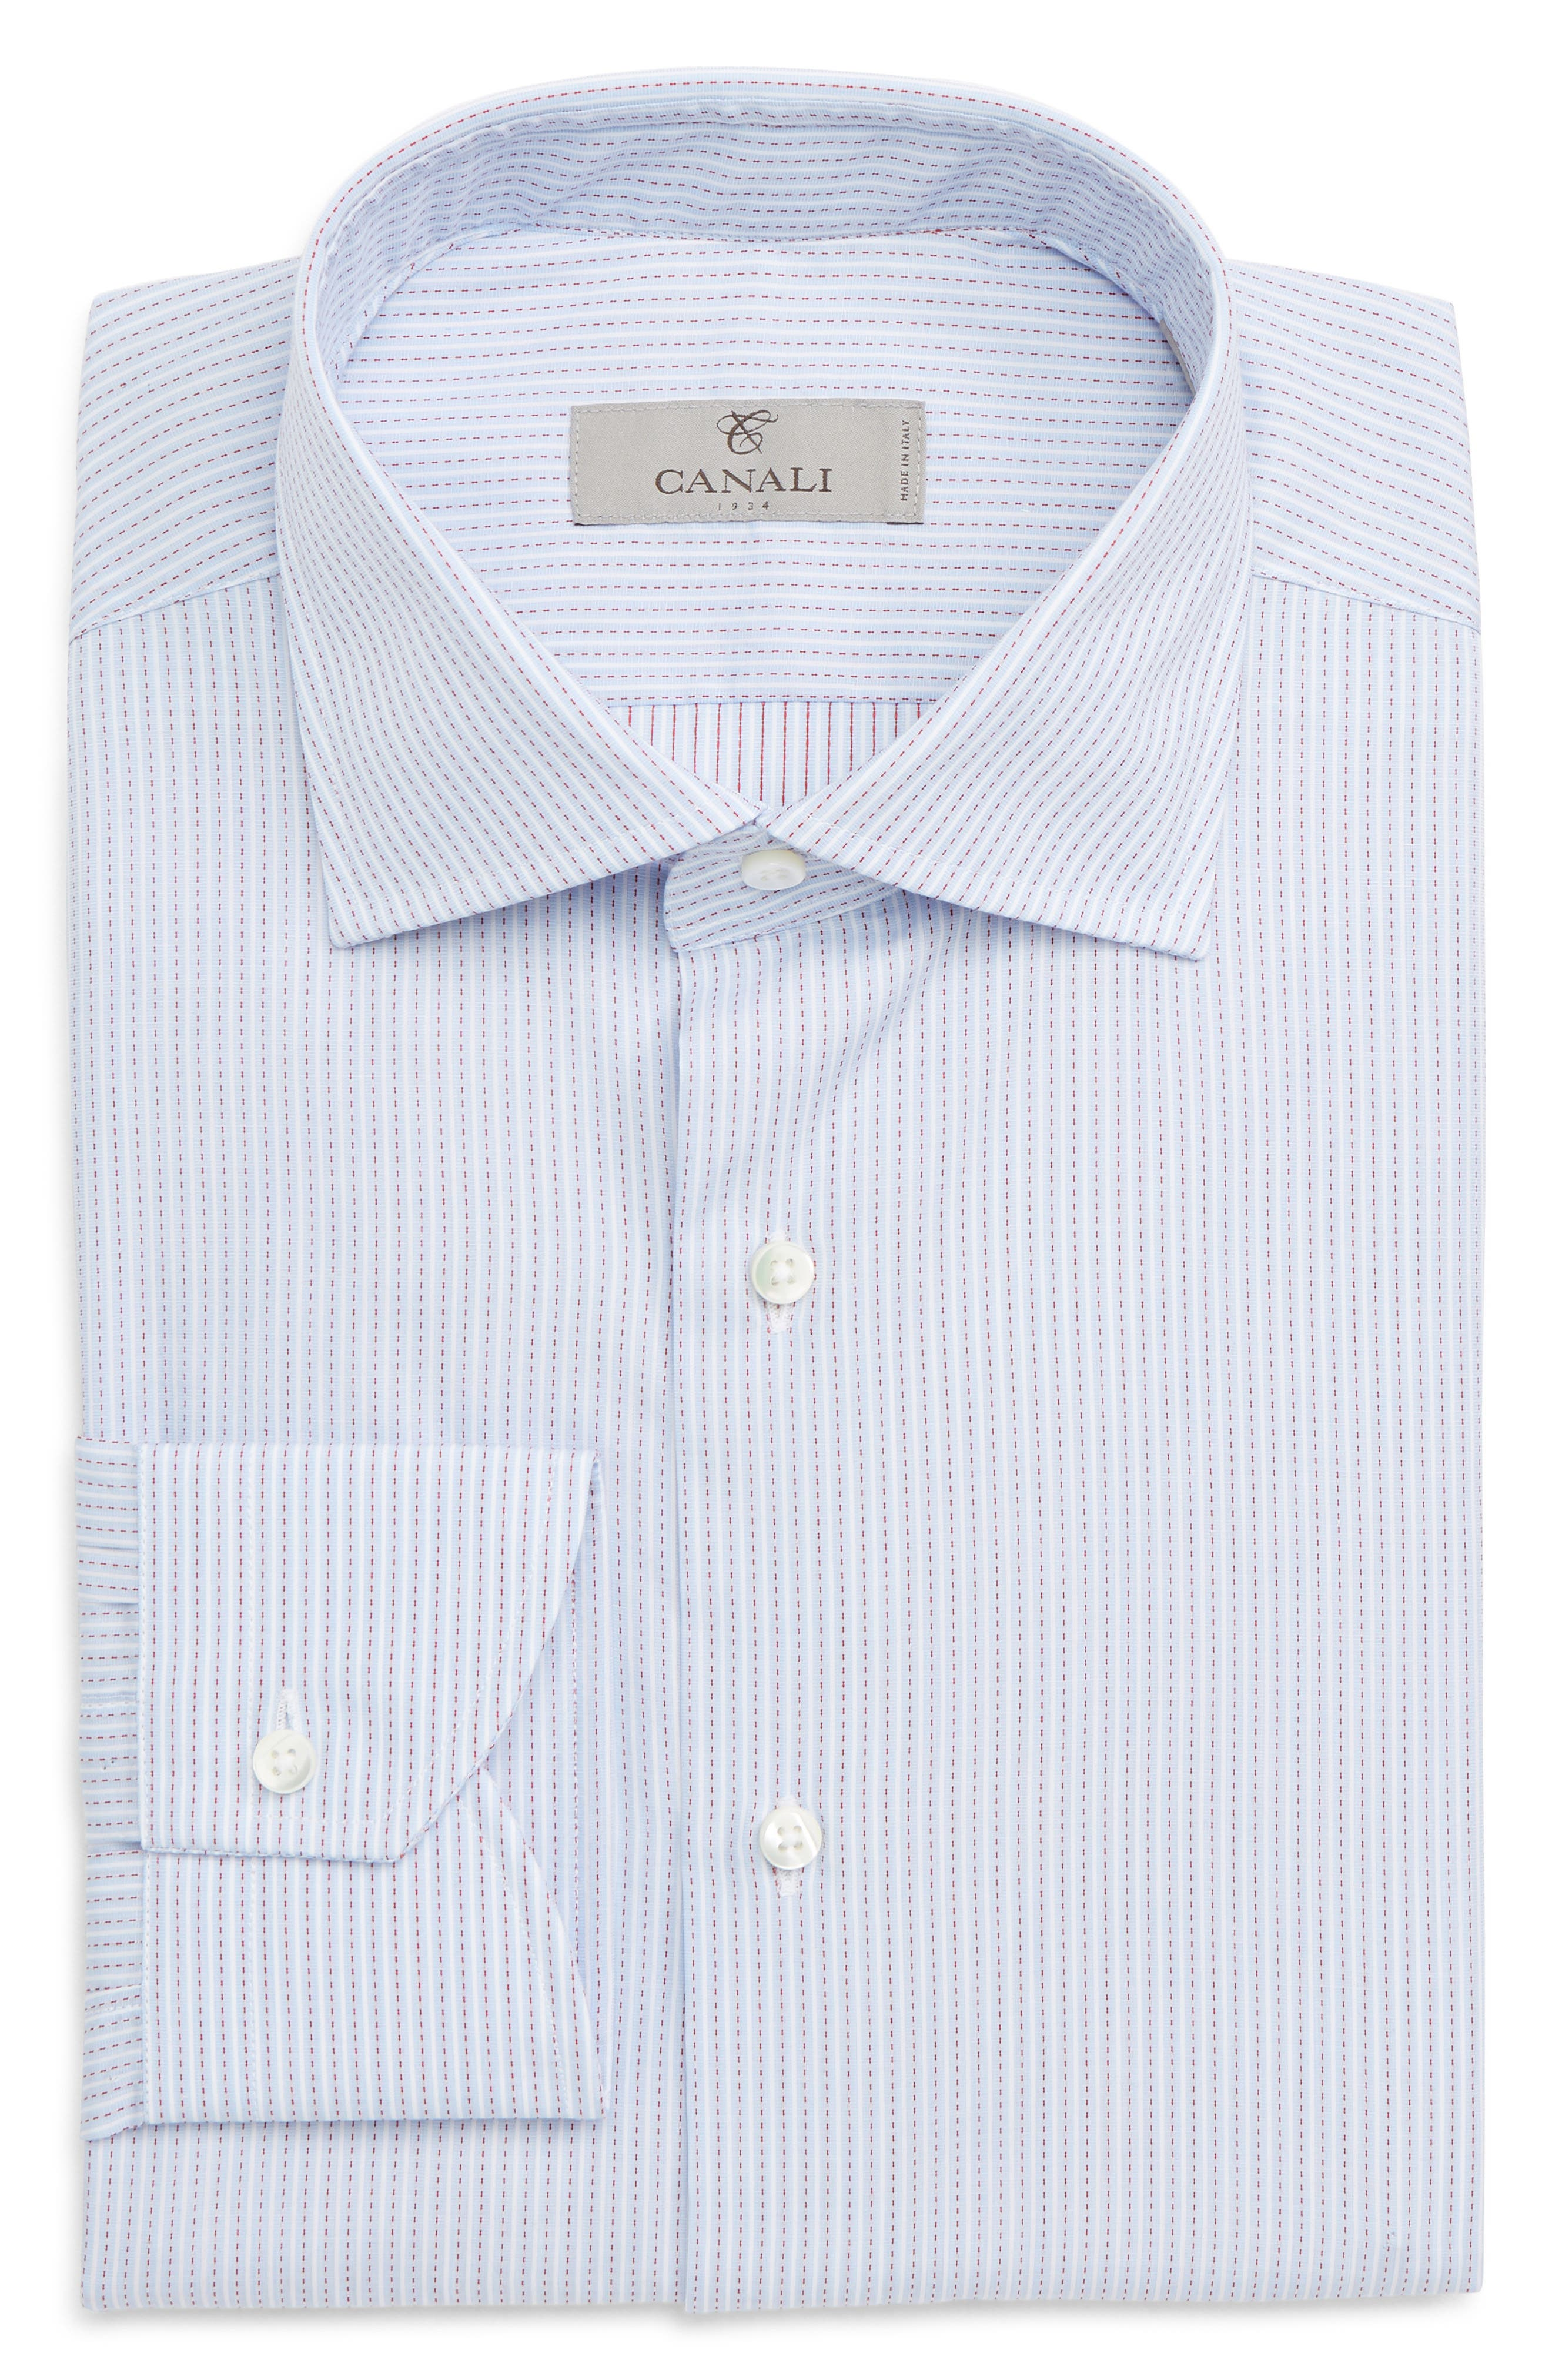 Trim Fit Stripe Dress Shirt,                             Alternate thumbnail 6, color,                             MED BLUE